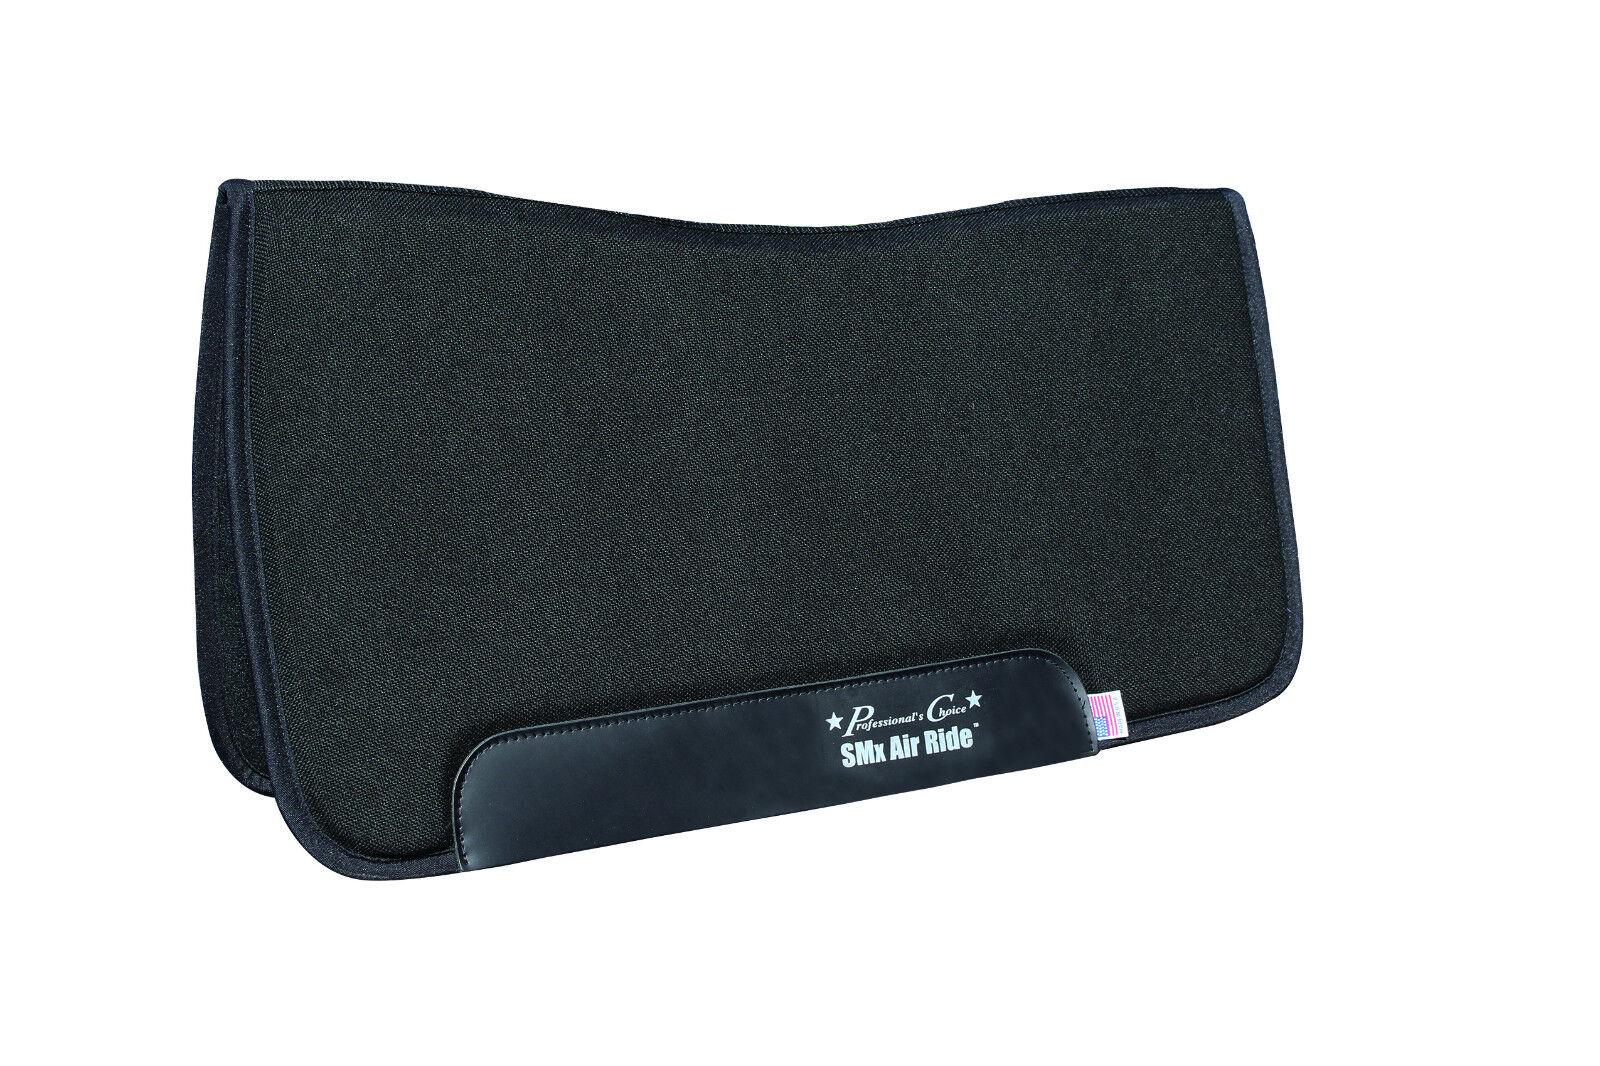 Professionals Choice SMx Air Ride Negro de alrojoedor de almohadilla para silla de 30  X 32  Fieltro